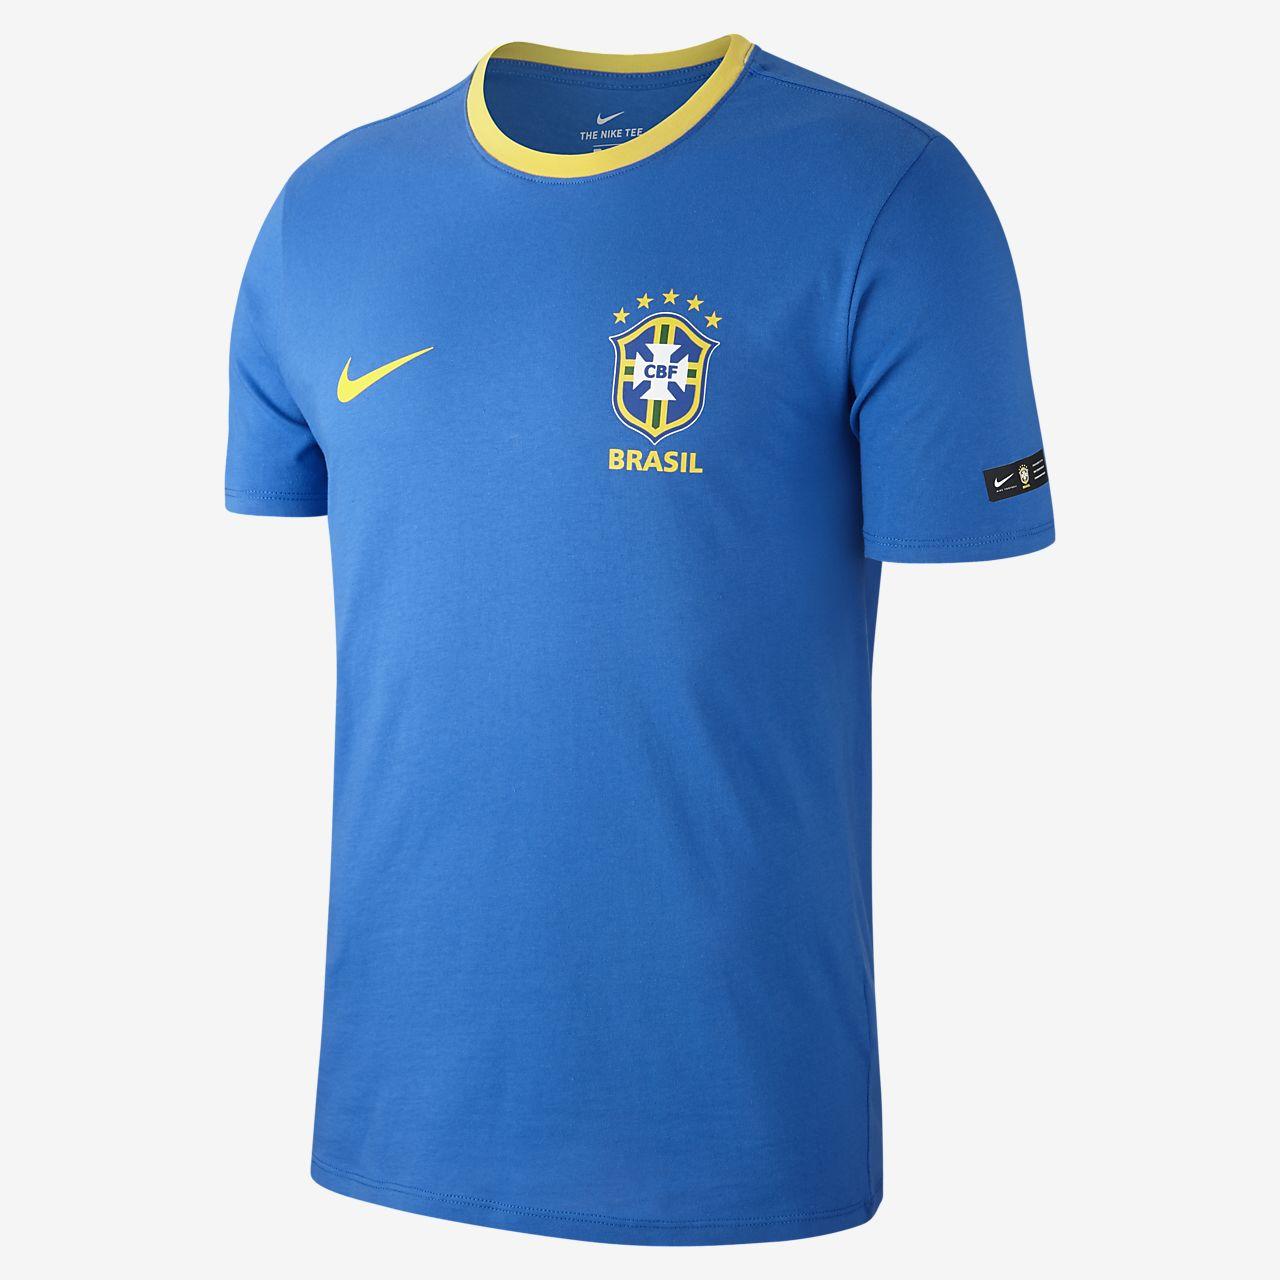 3aec625911dc4 Brasilien CBF Crest Herren-T-Shirt. Nike.com DE